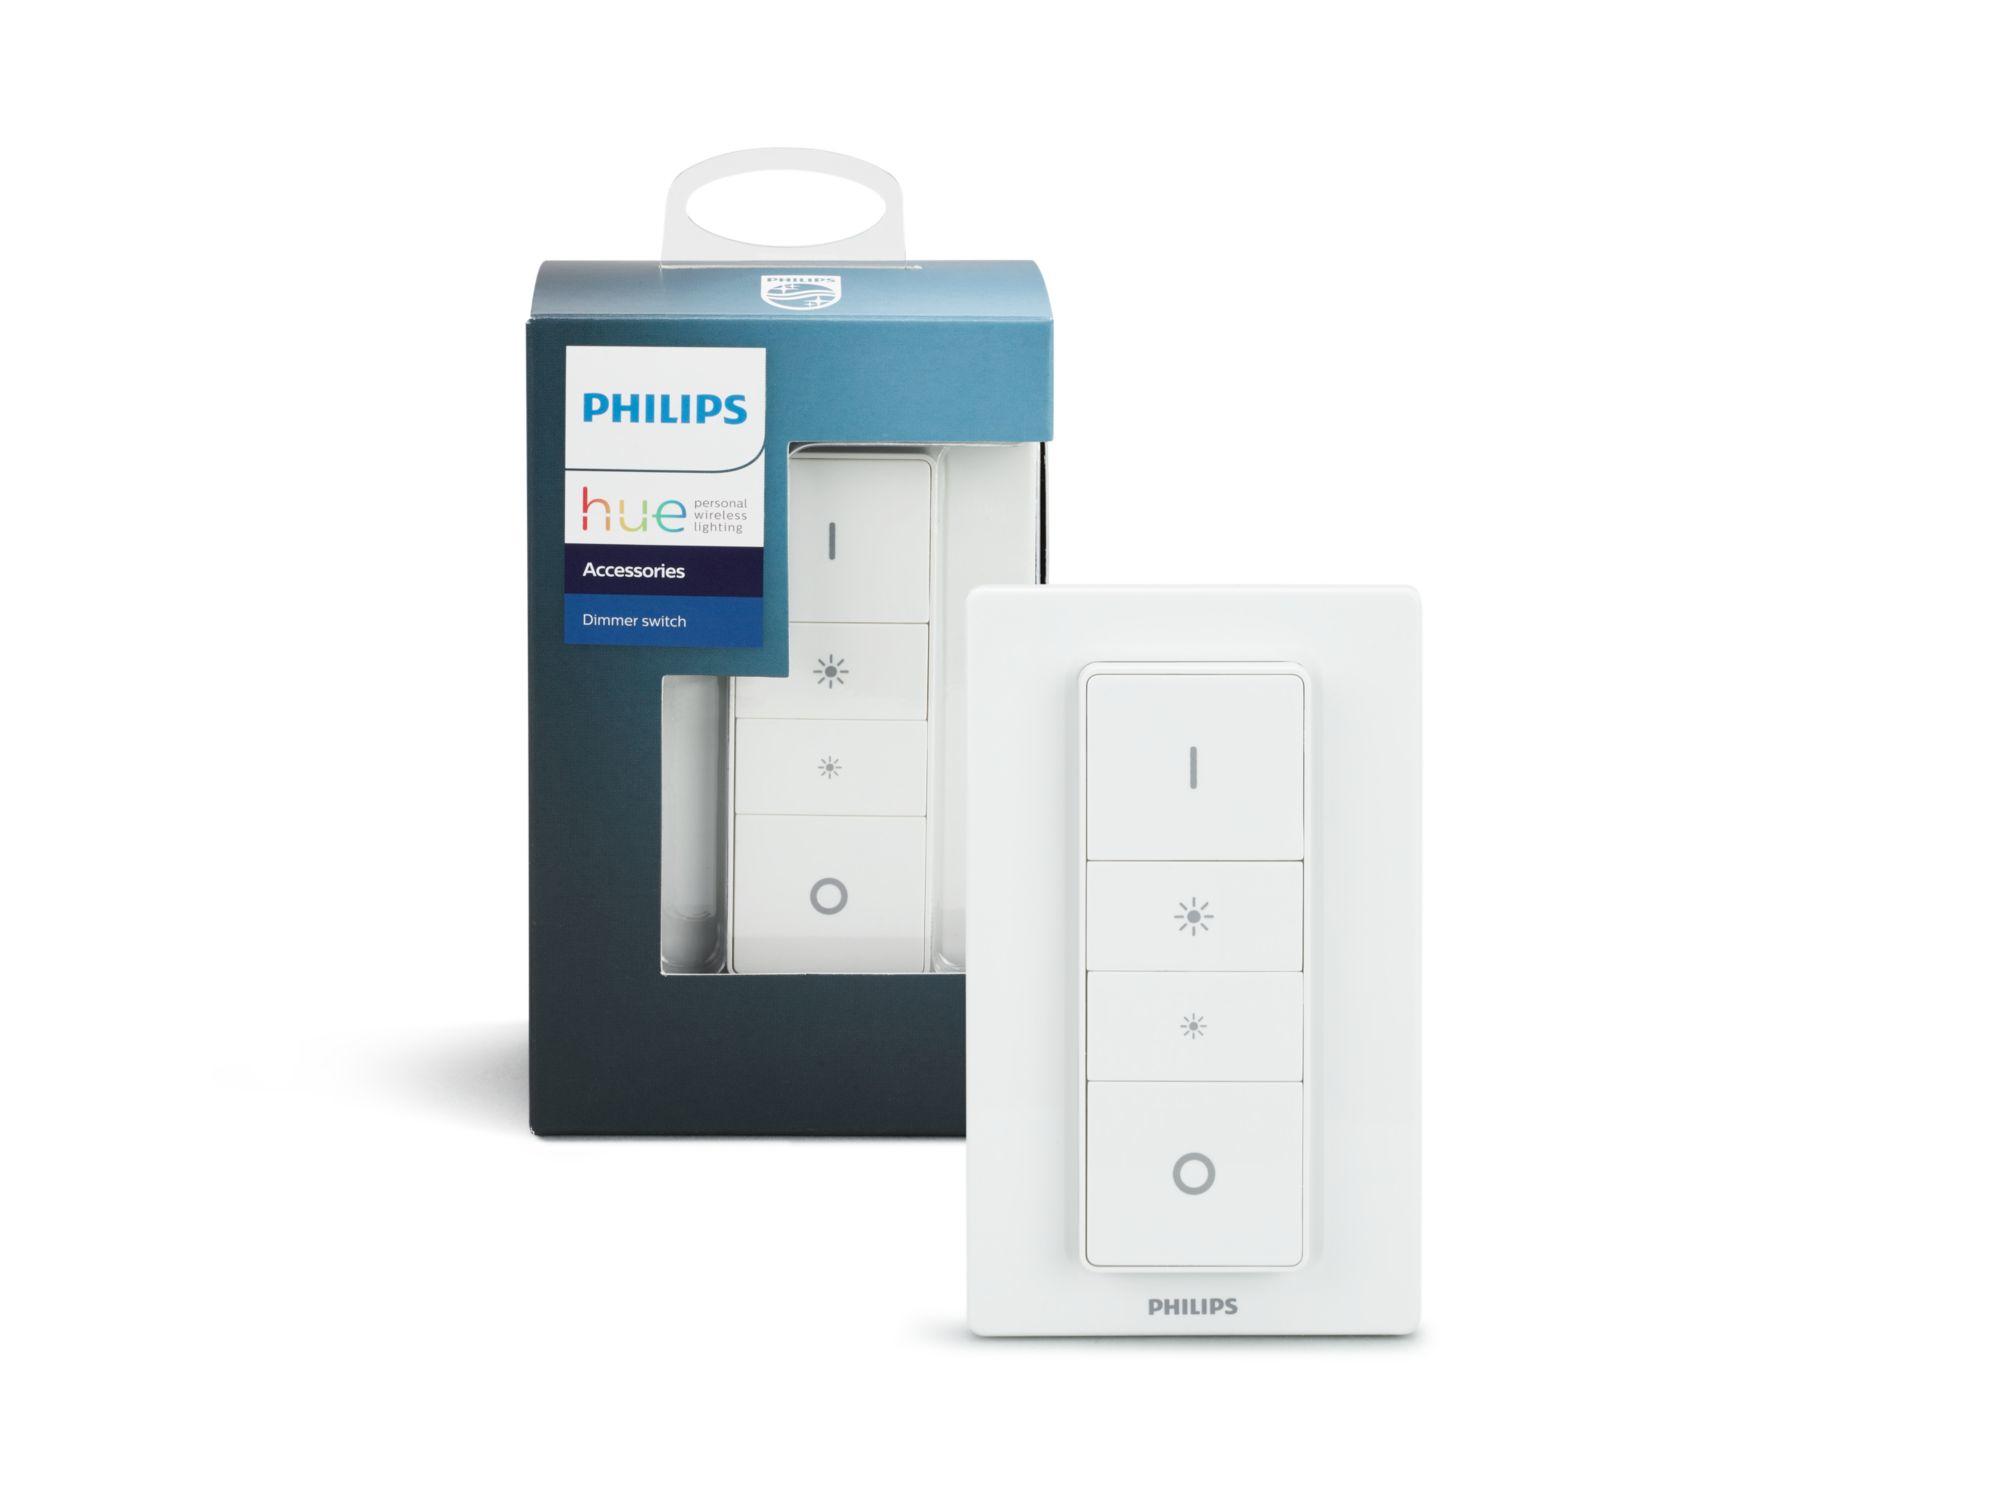 Philips Hue Dim Switch